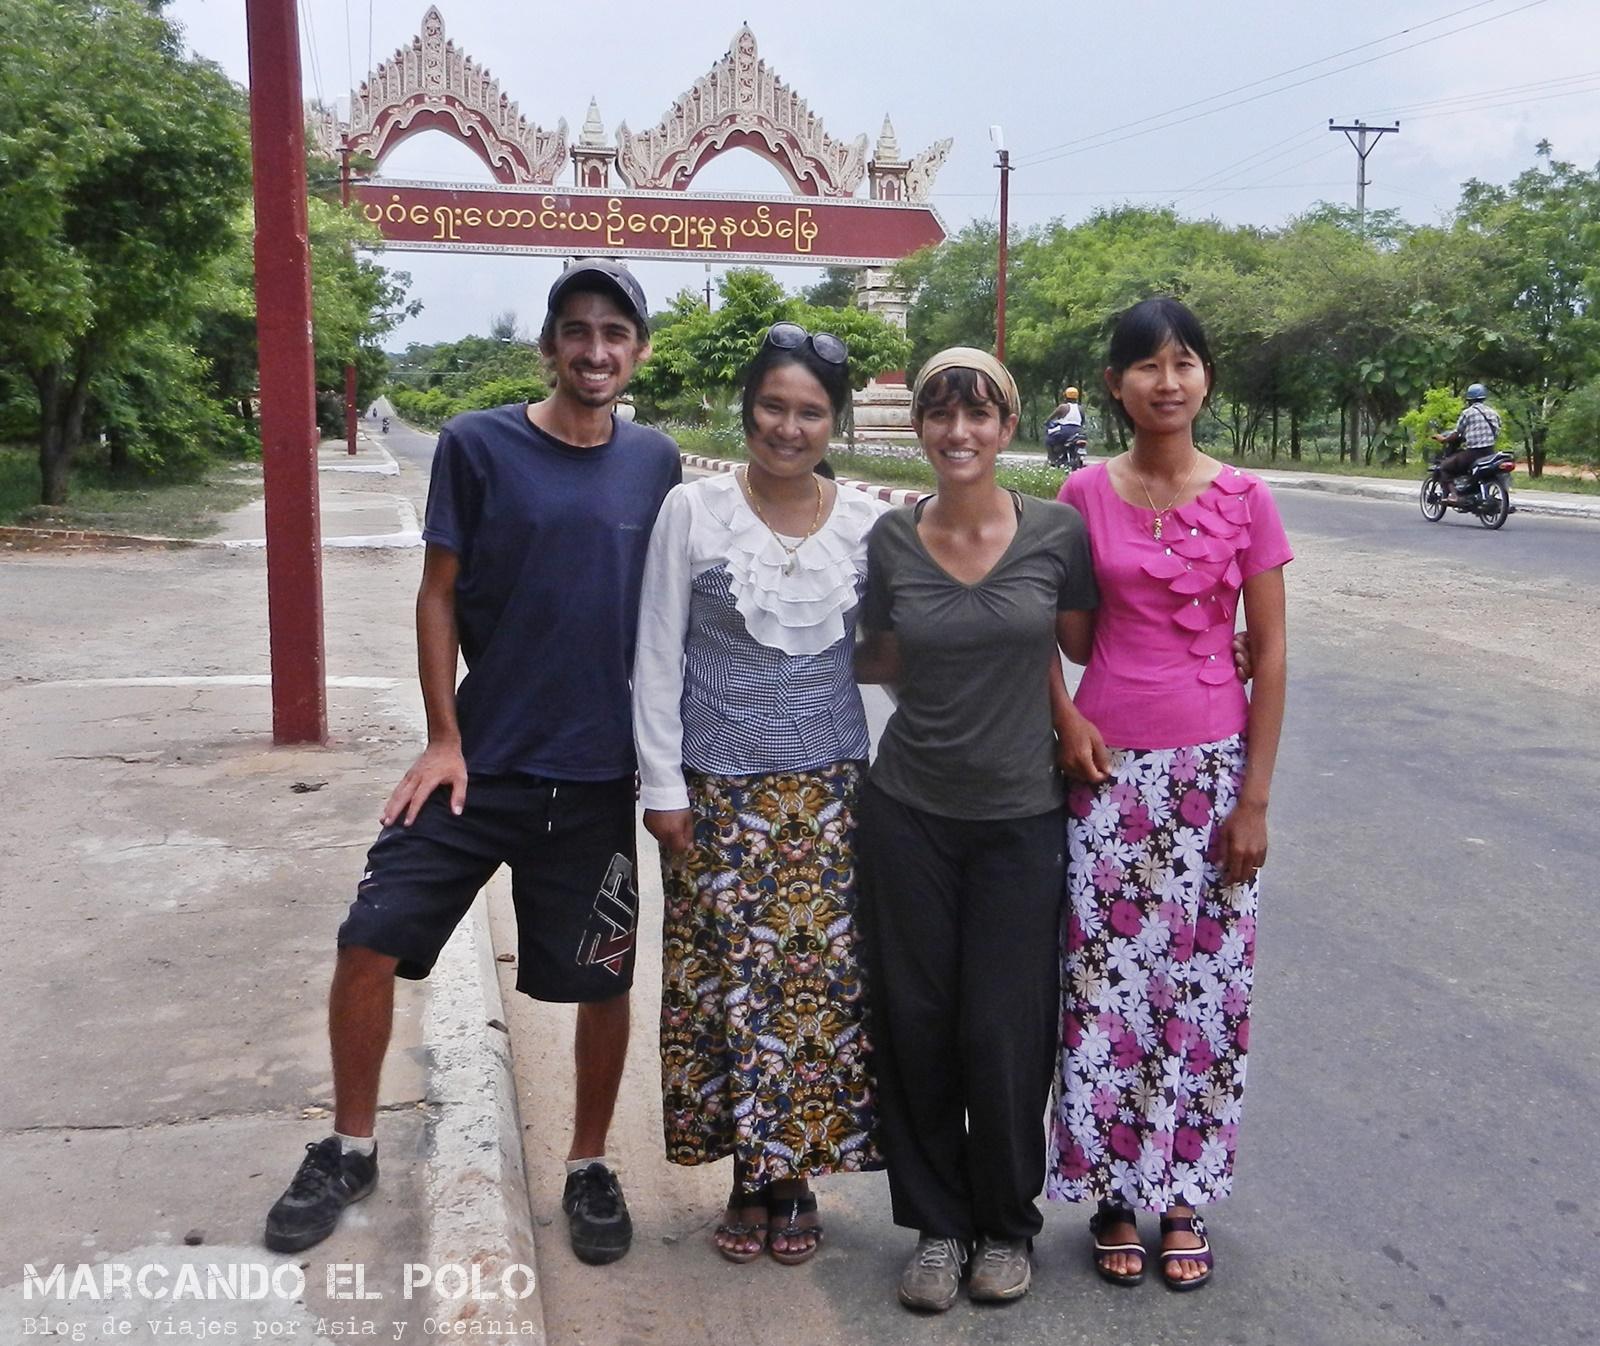 Viajar a dedo en Myanmar. Chicas que nos levantaron